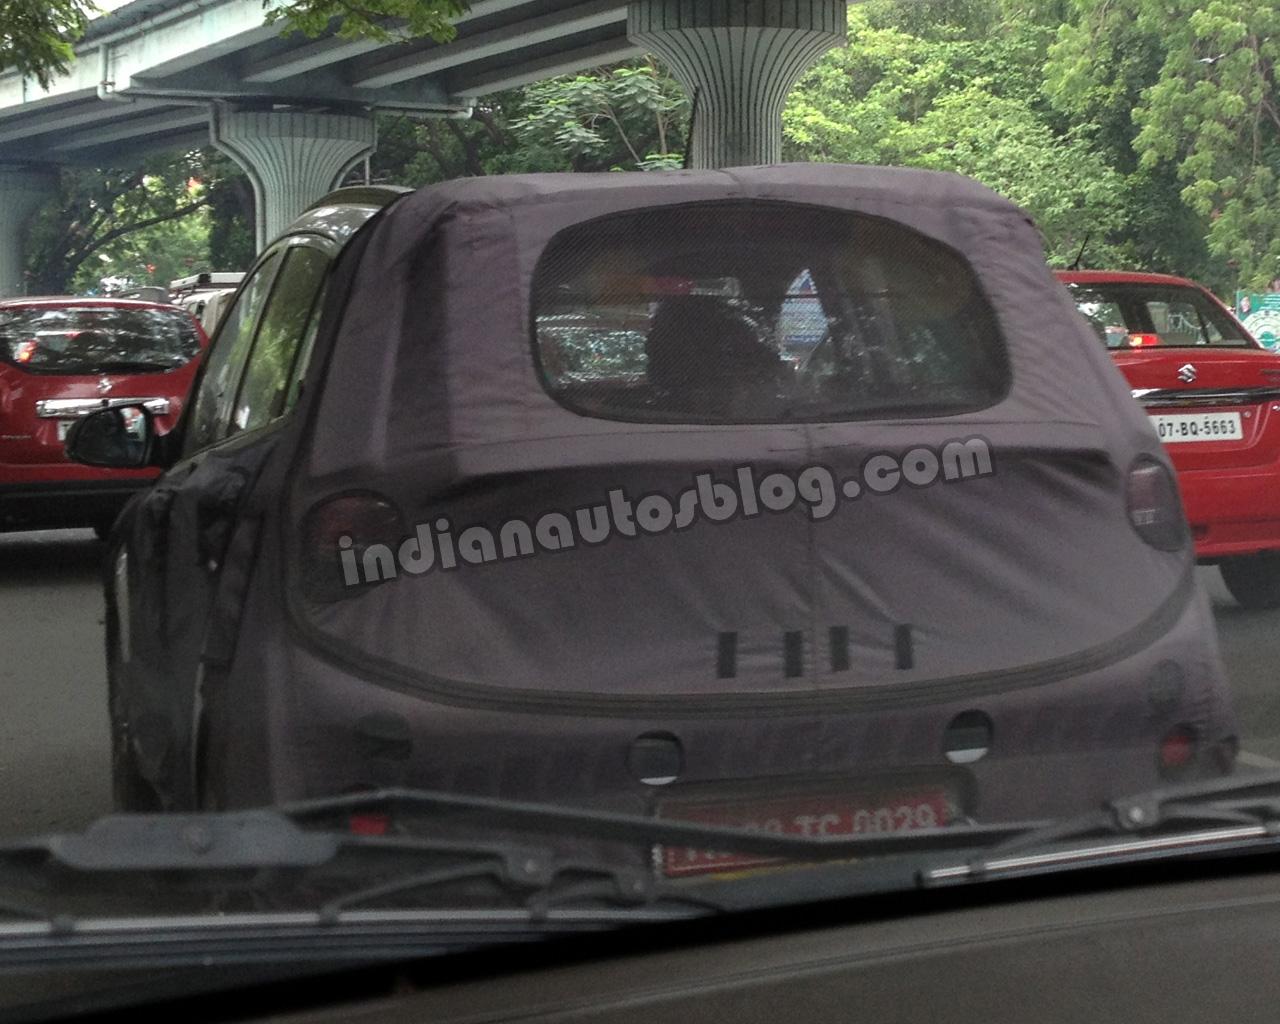 2014 Hyundai i10 spied in India